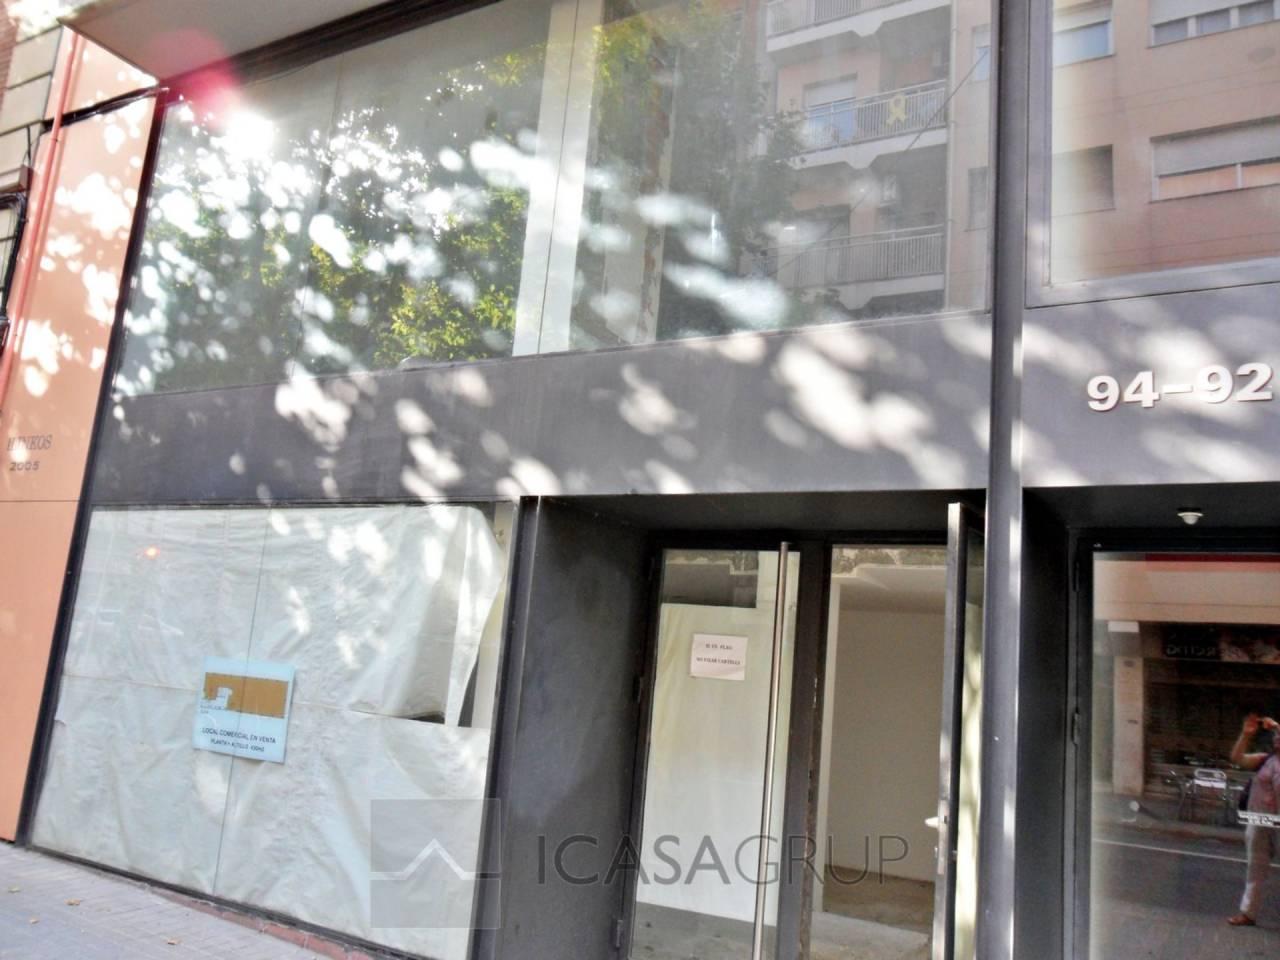 Local dúplex en venta en La Creu Alta – Sabadell